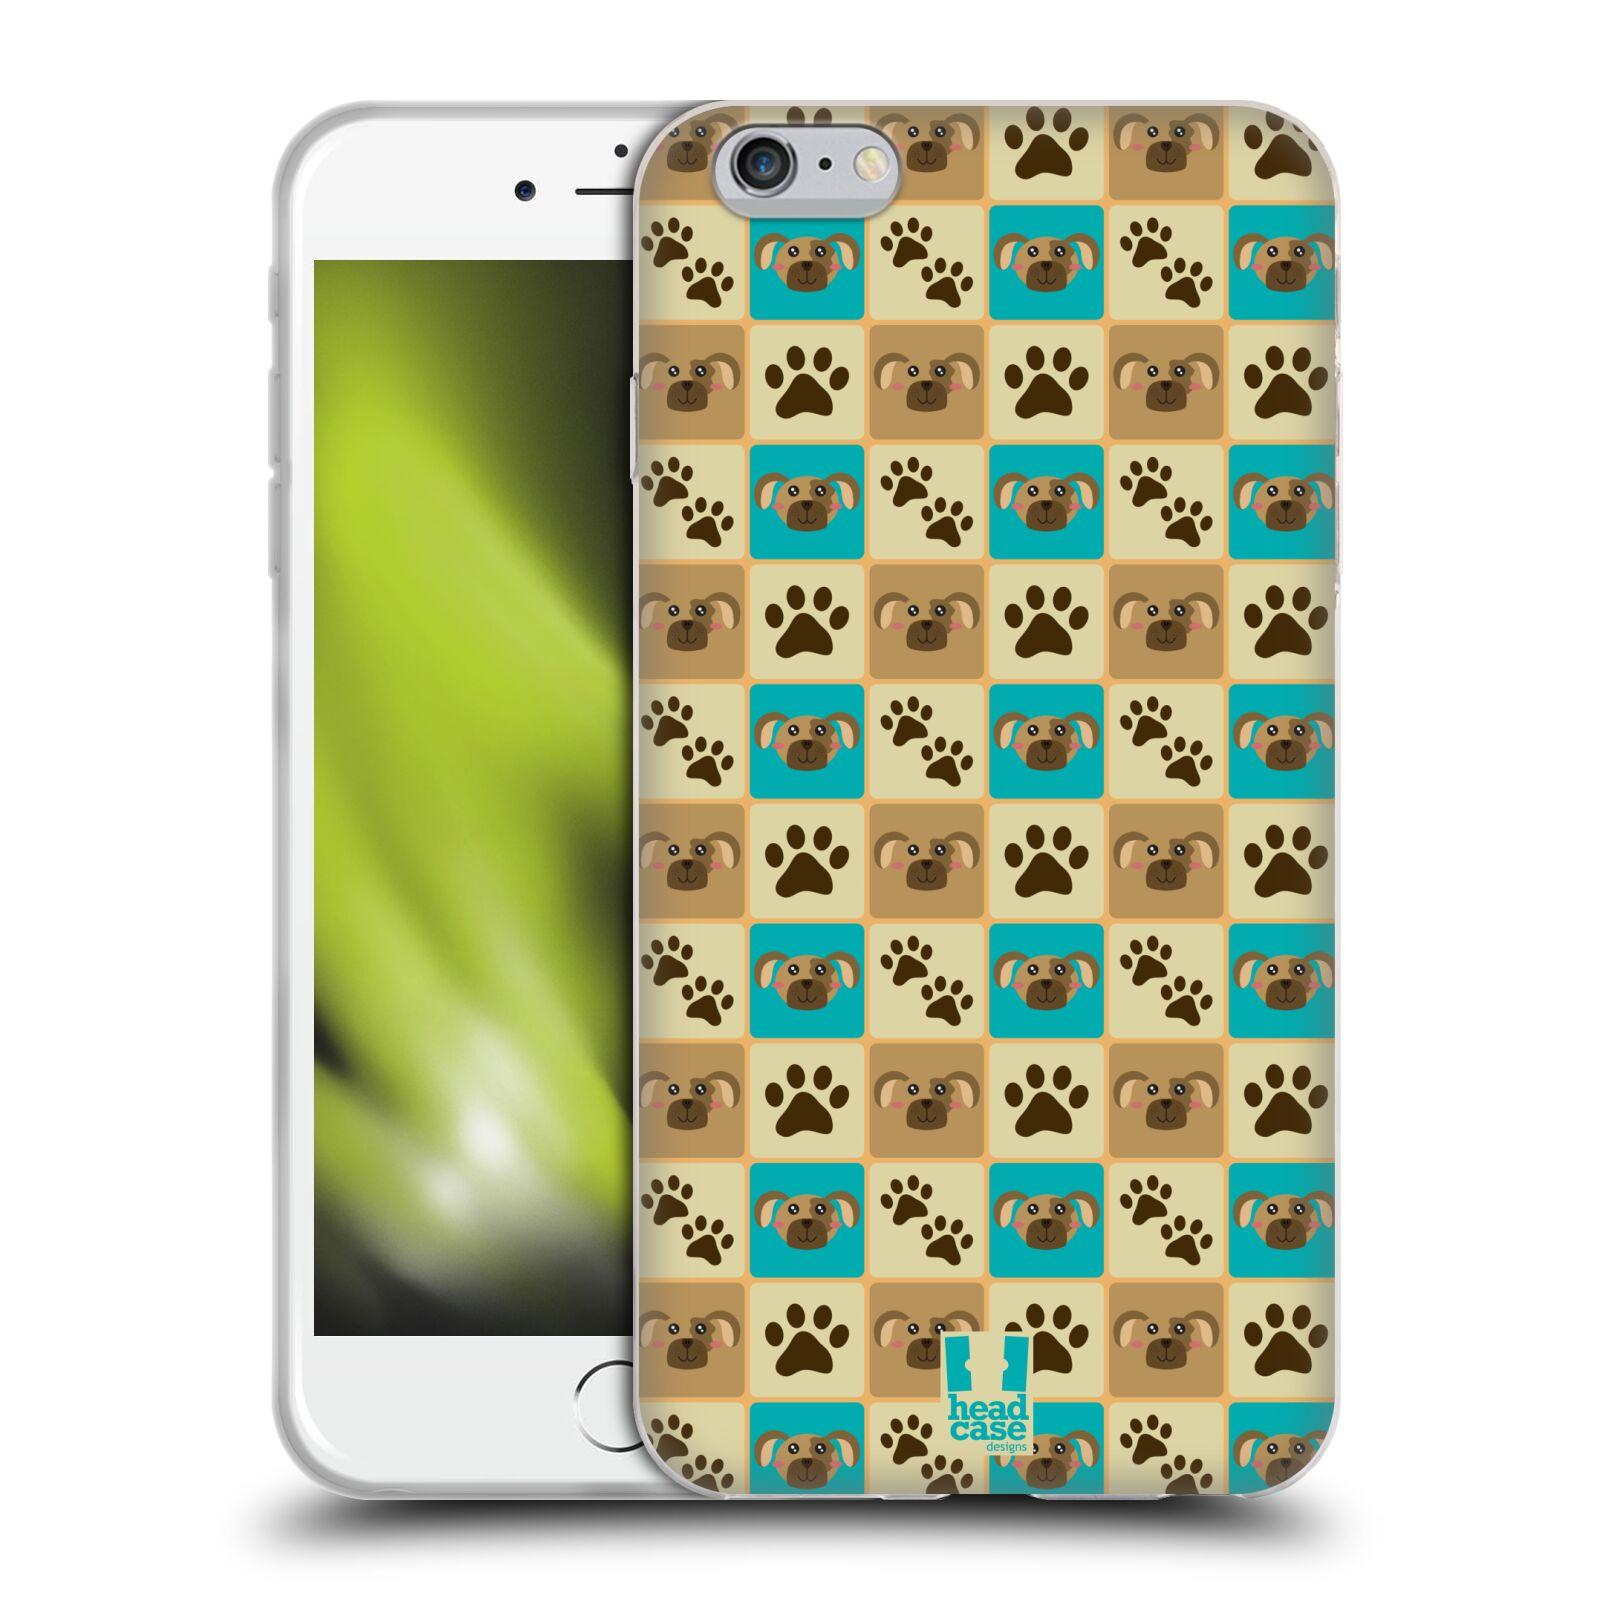 HEAD CASE silikonový obal na mobil Apple Iphone 6 PLUS/ 6S PLUS vzor Zvířecí razítka PSÍ TLAPKA